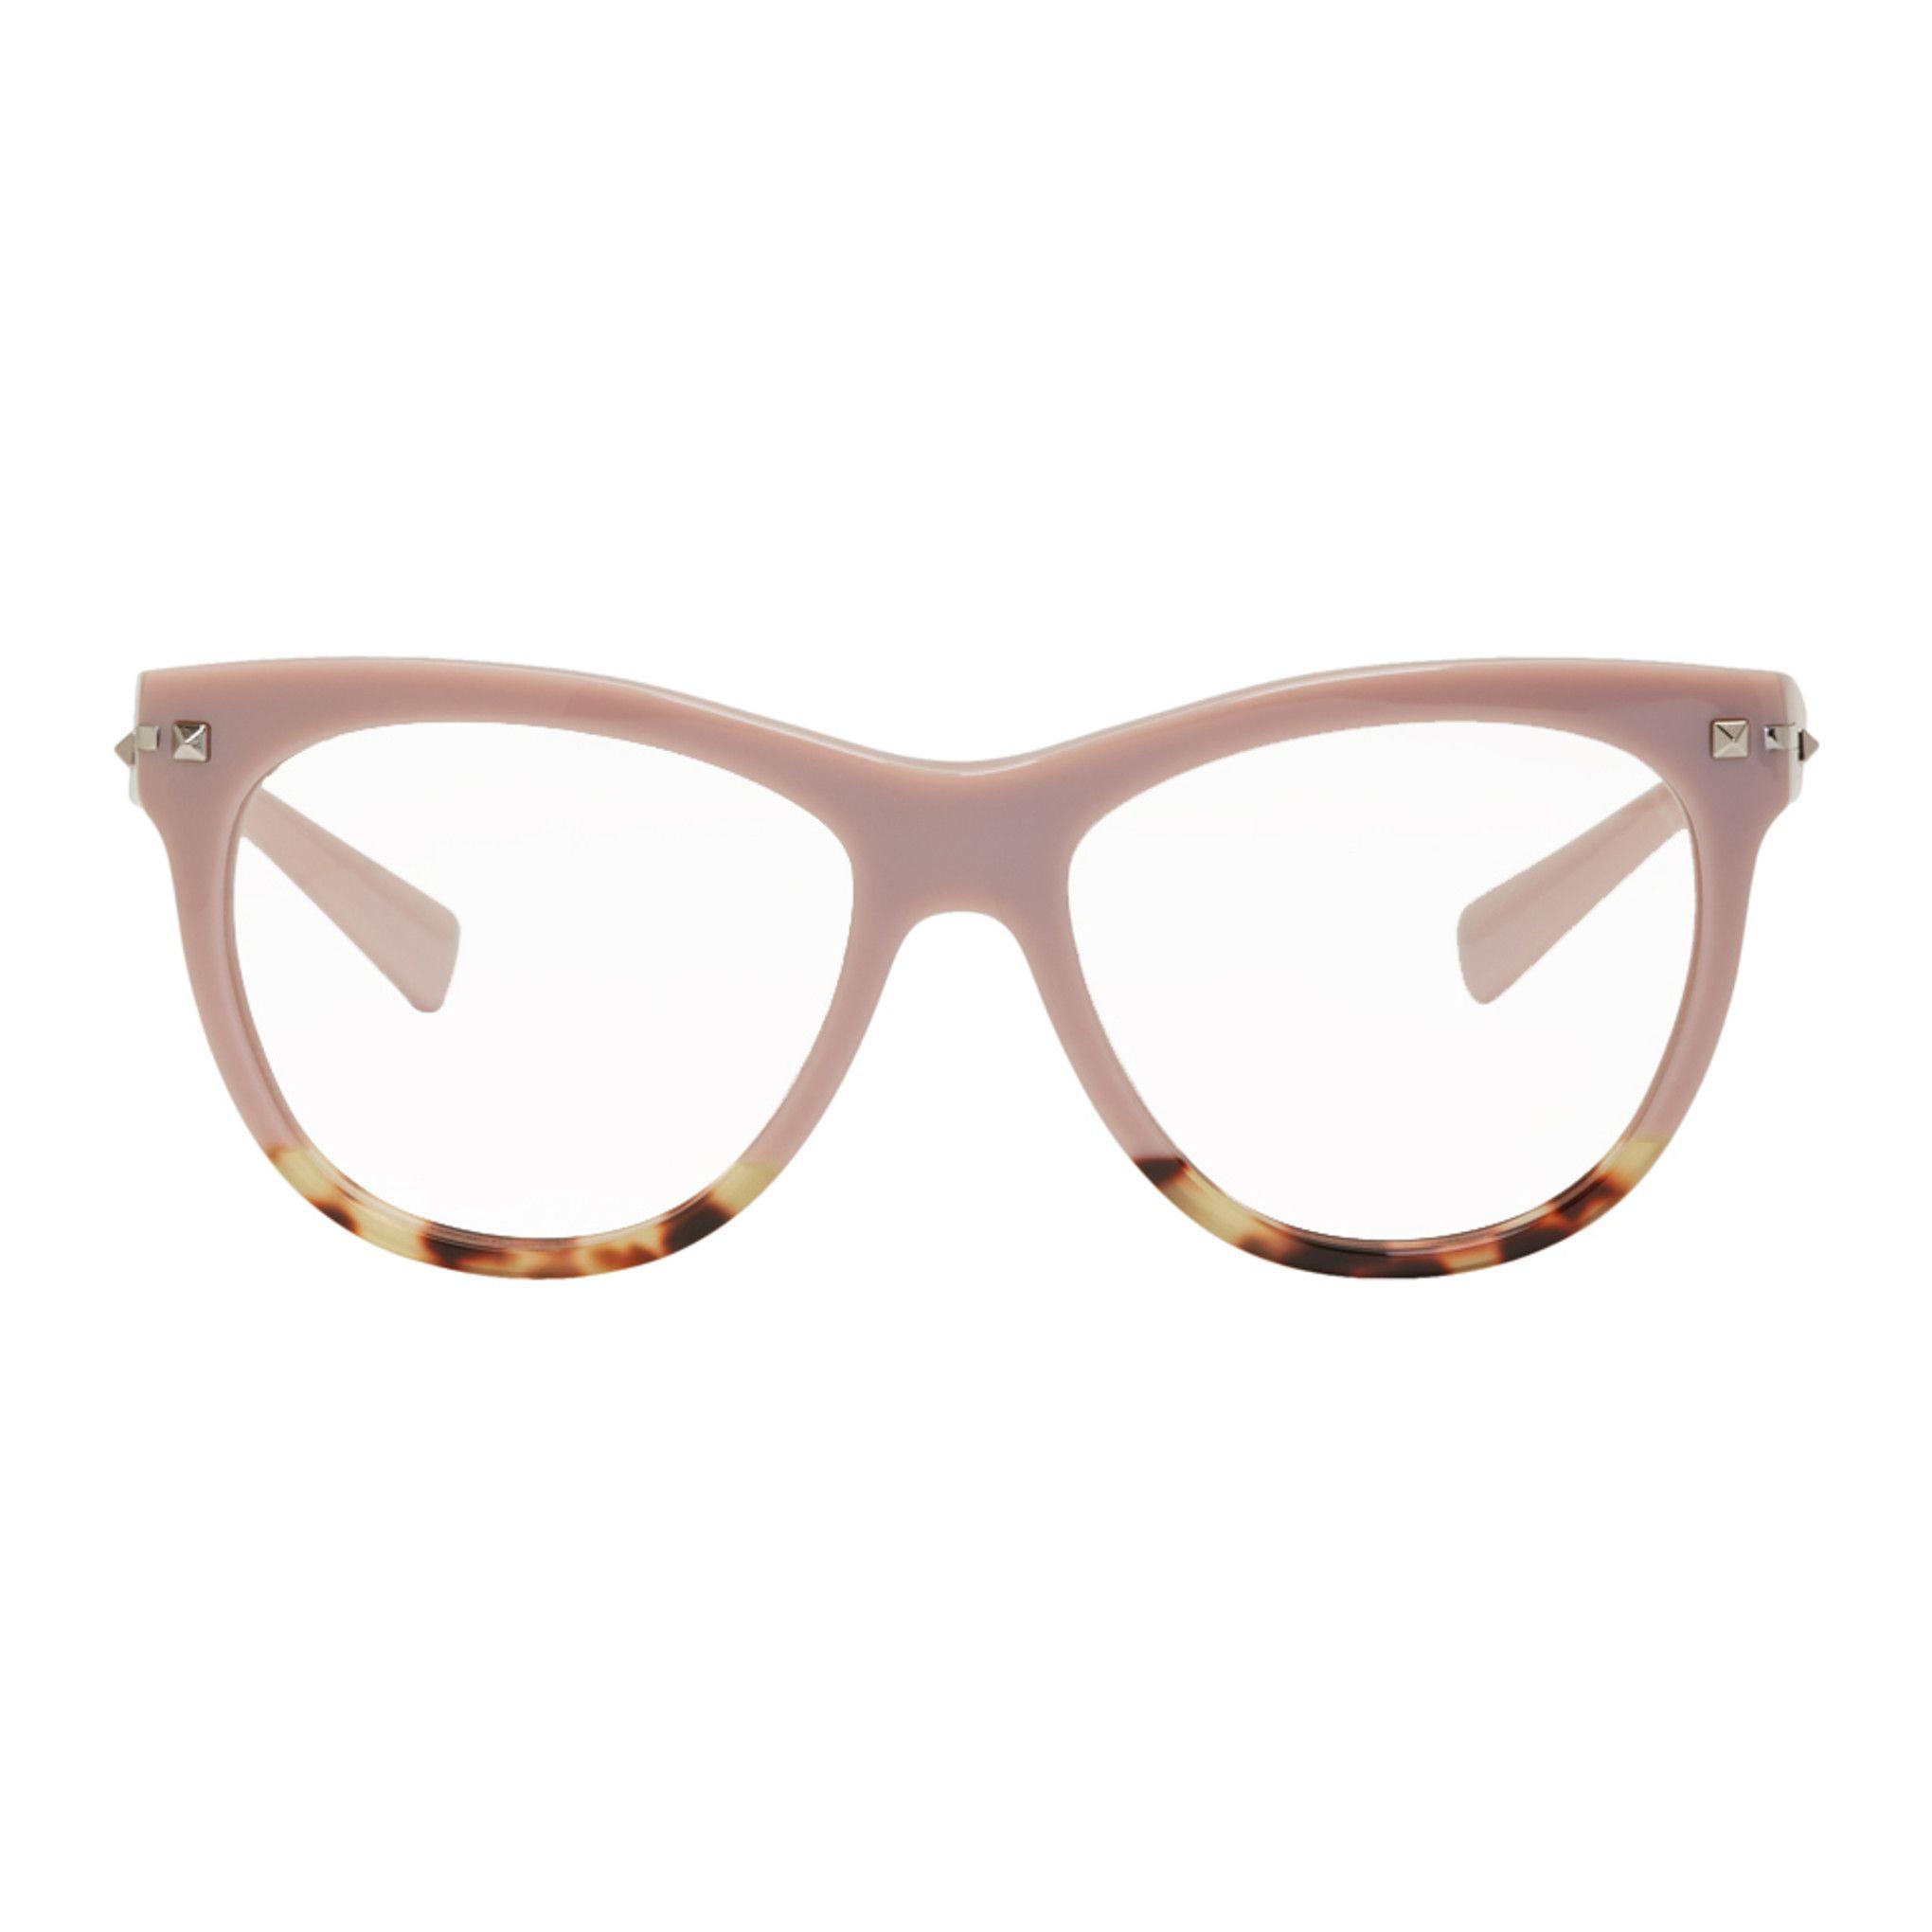 b787547a5fa Valentino - Pink Valentino Garavani Sartorial Rockstud Glasses Round  Eyeglasses